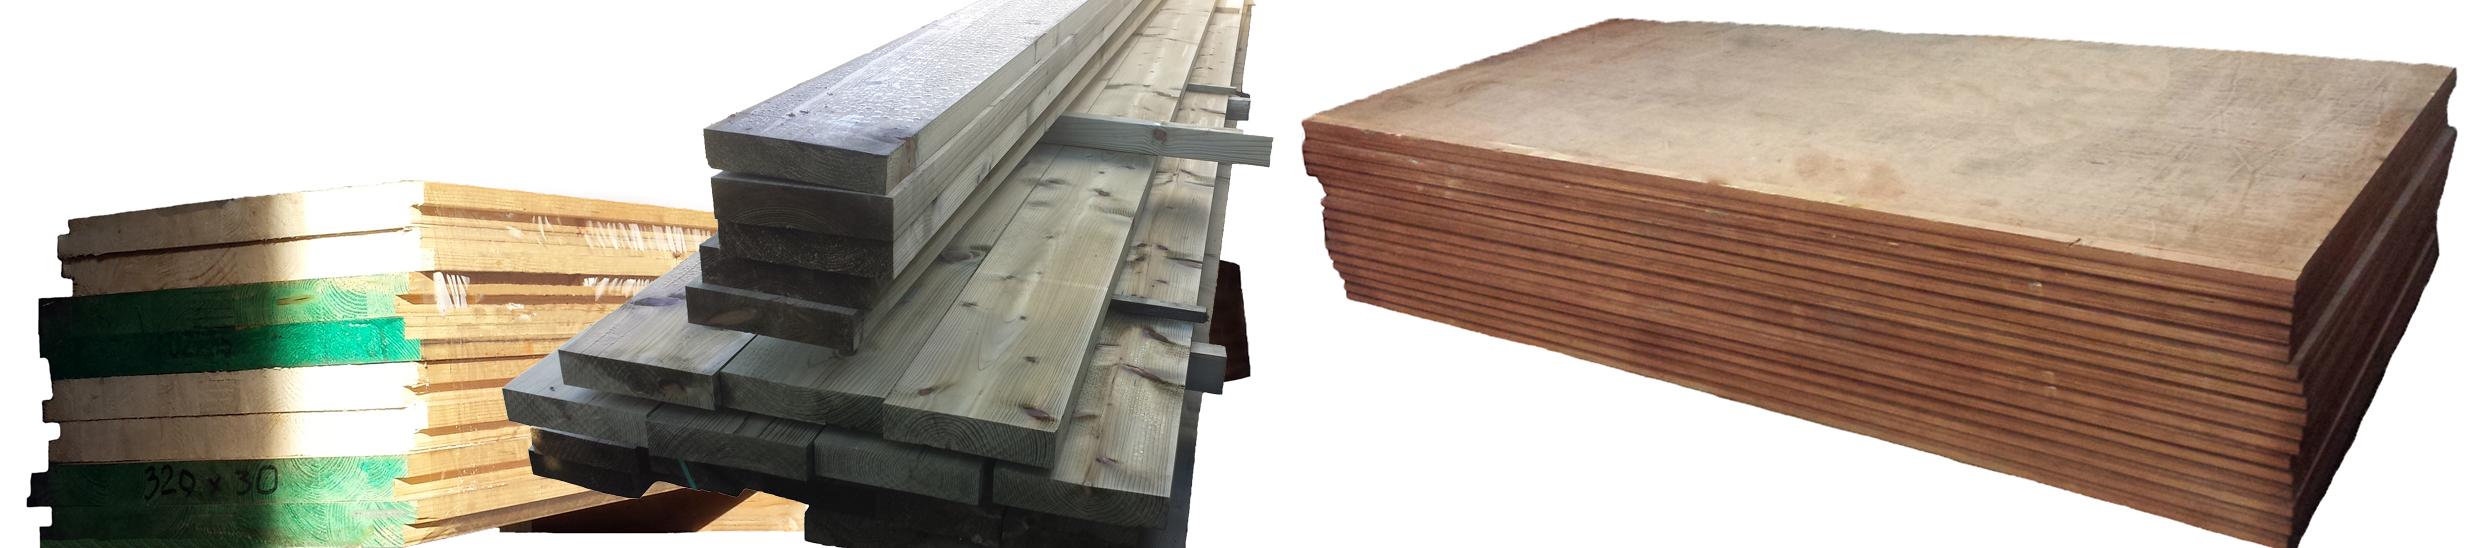 Hout / Wood